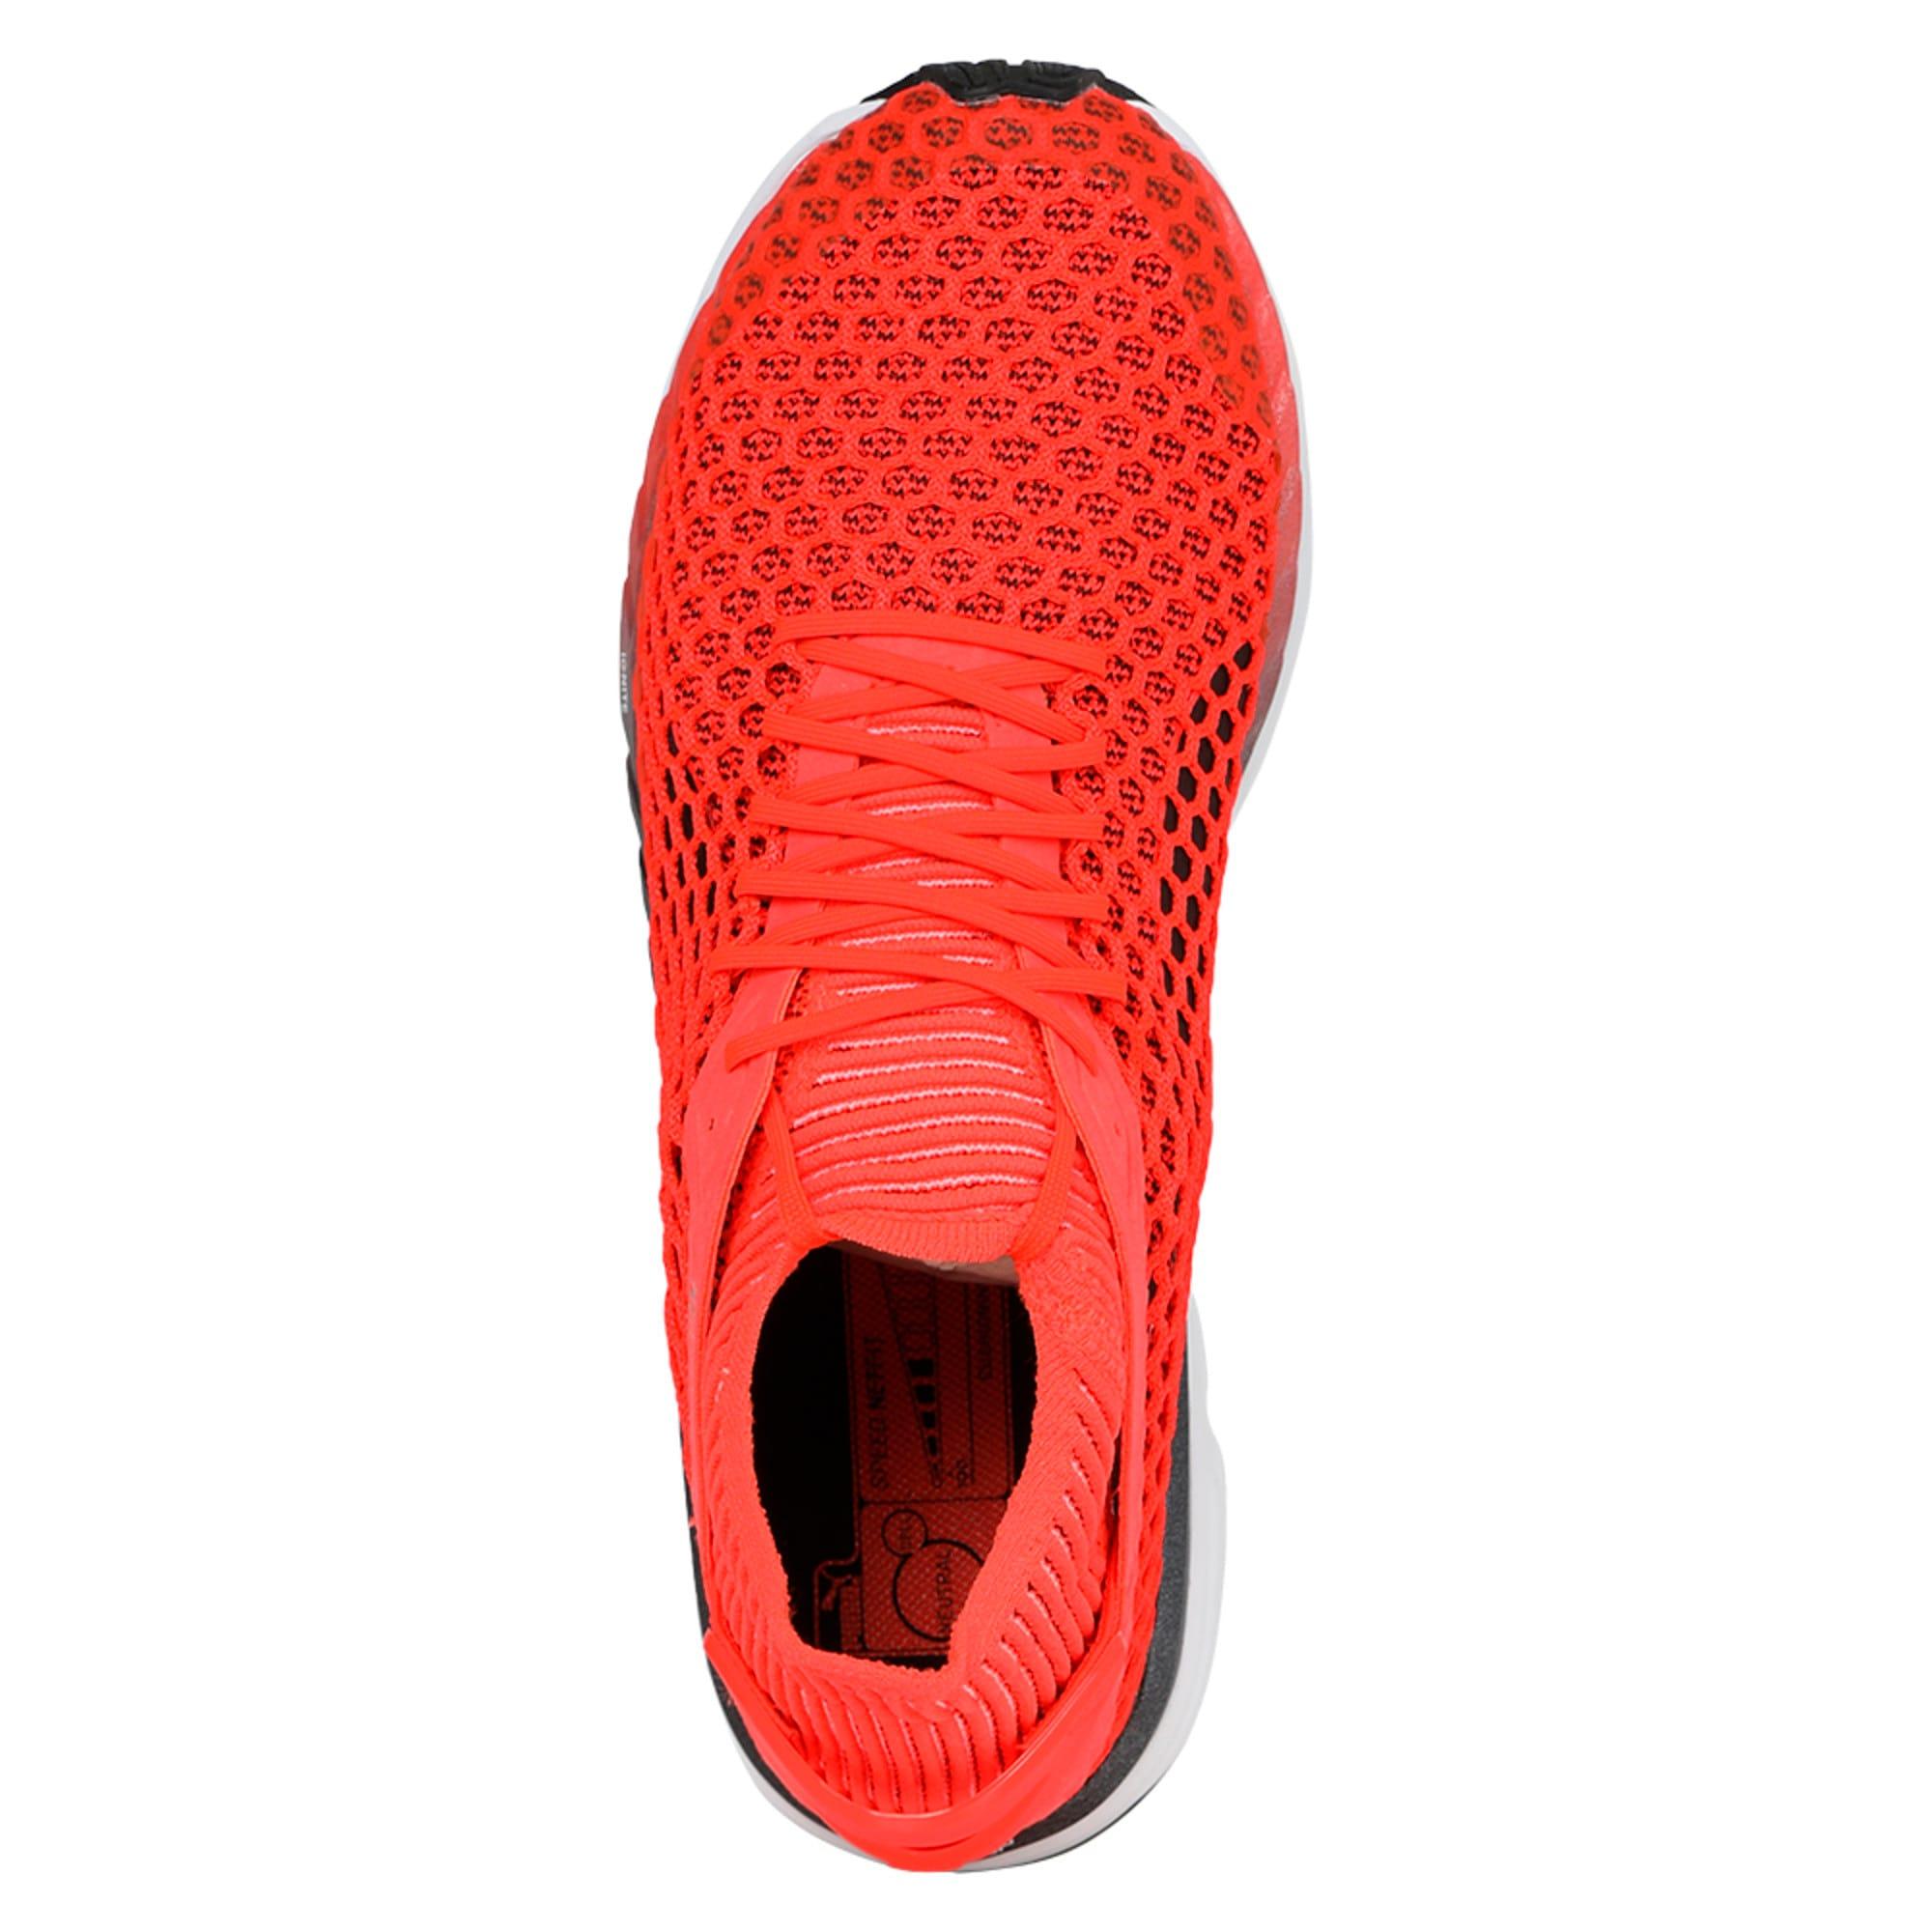 Thumbnail 3 of Speed IGNITE NETFIT 2 Men's Running Shoes, Red Blast-White-Black, medium-IND